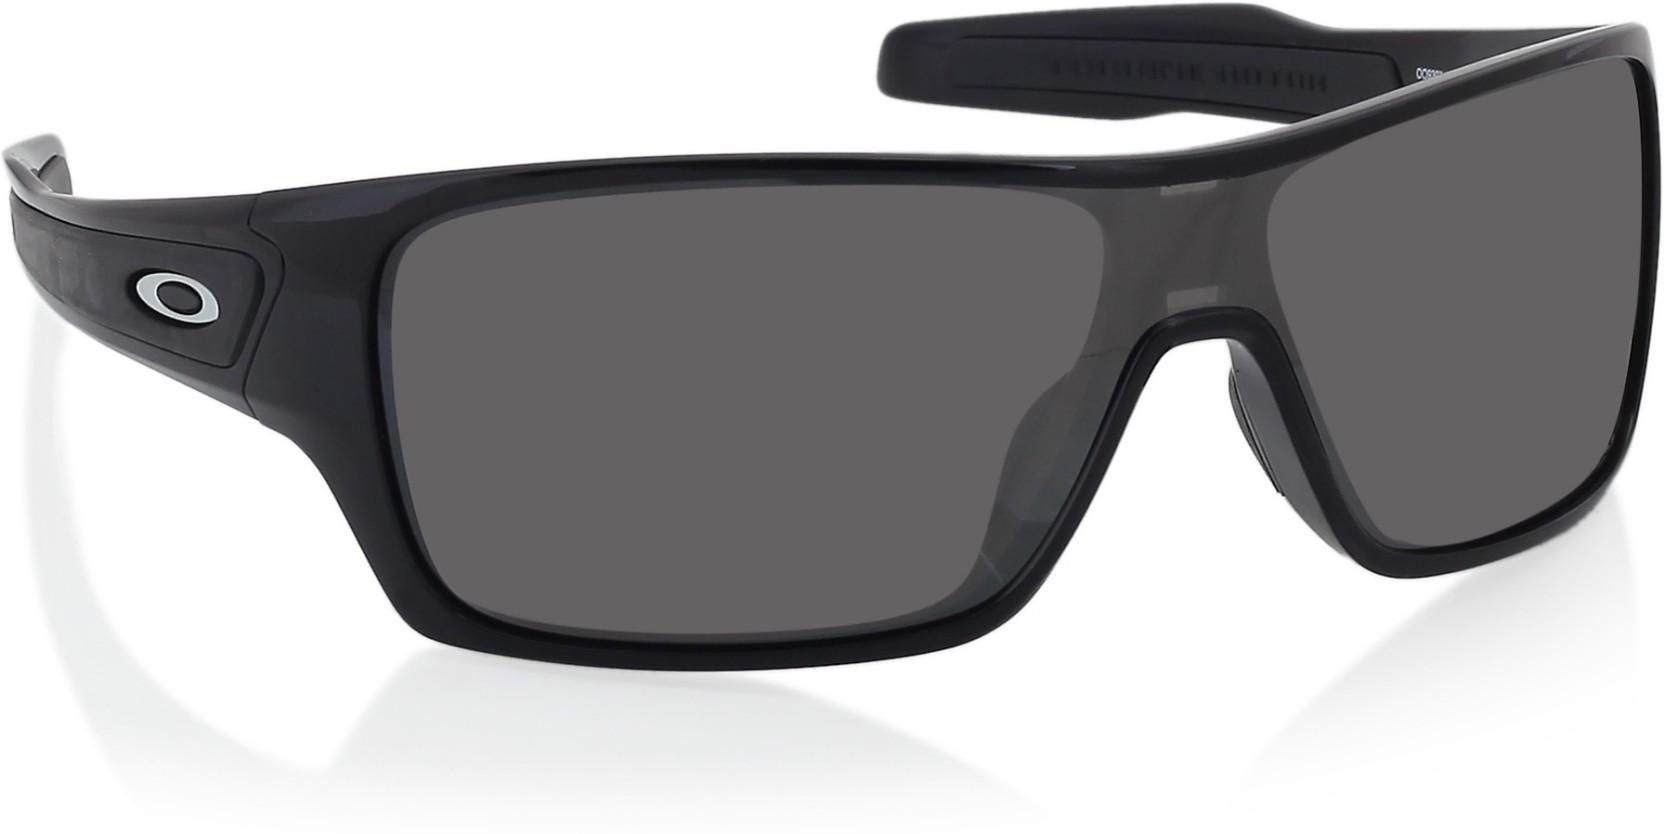 e50319178e Buy Oakley TURBINE ROTOR Wrap-around Sunglass Grey For Men Online ...